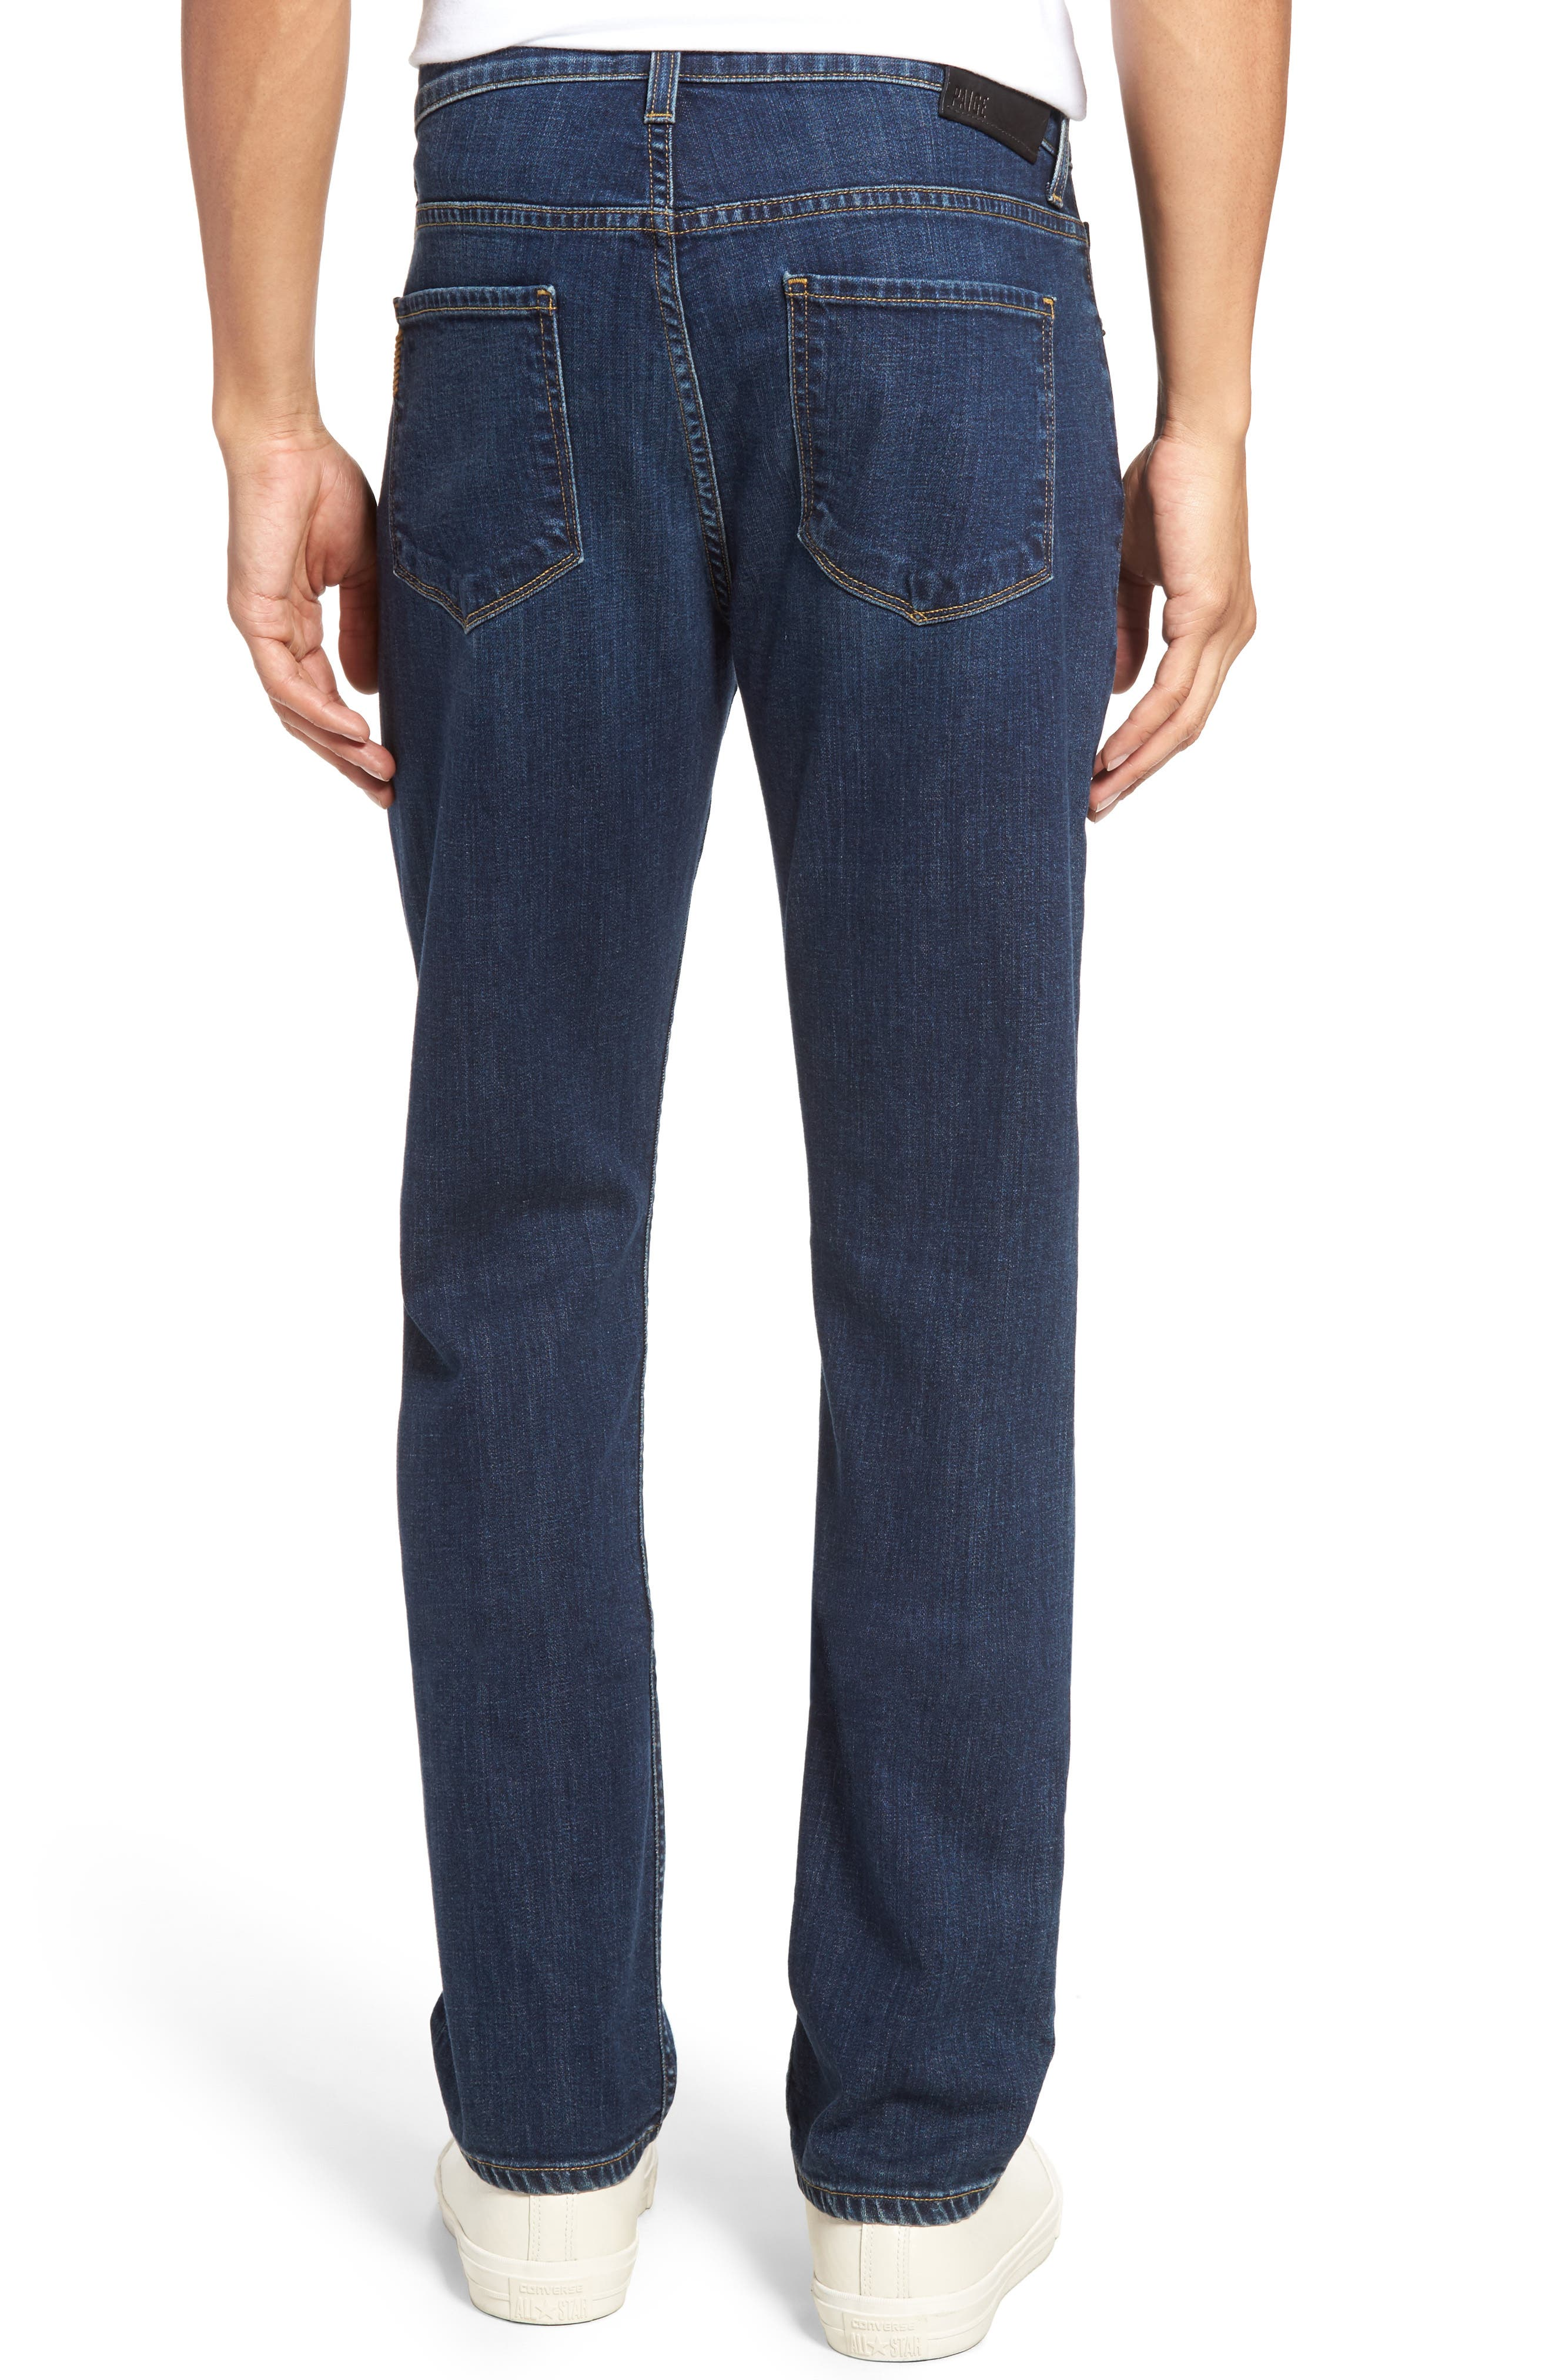 Normandie Straight Leg Jeans,                             Alternate thumbnail 2, color,                             ANGELO